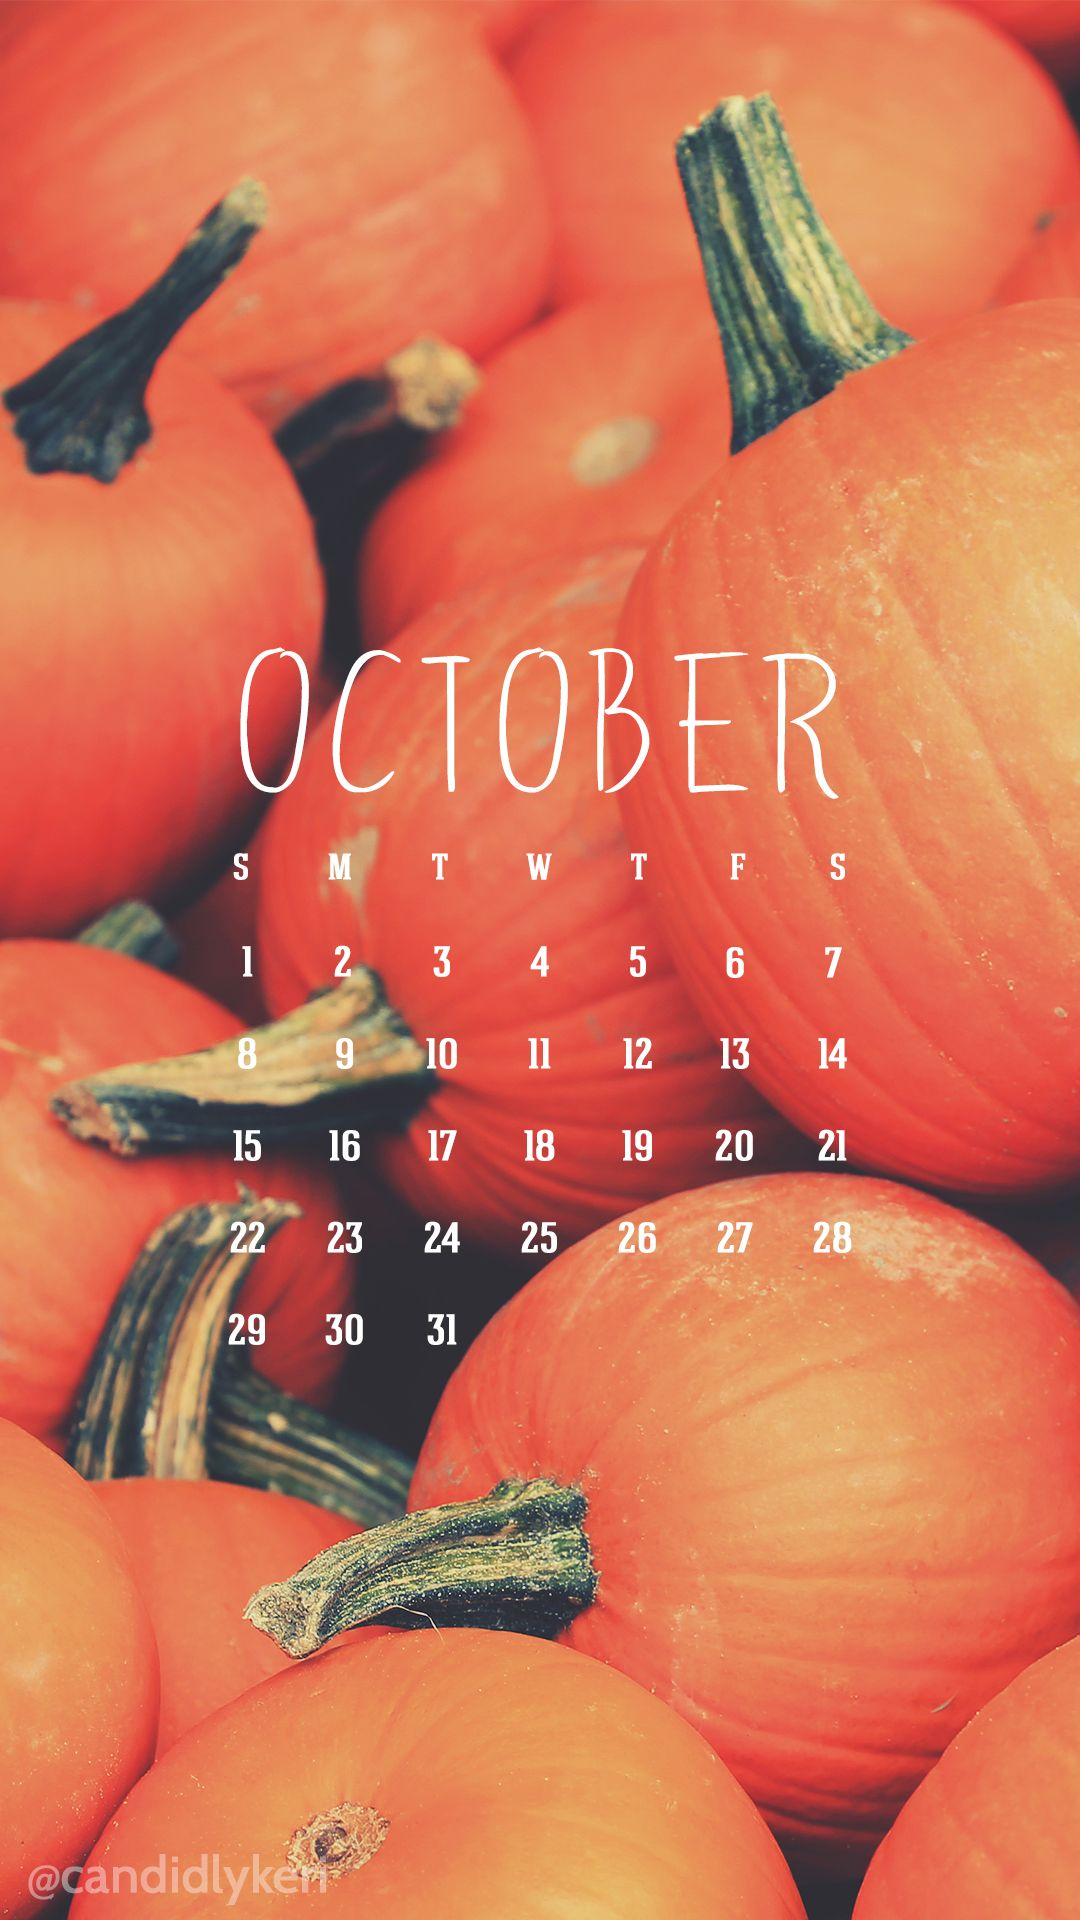 orange pumpkin fall October calendar 2017 wallpaper you